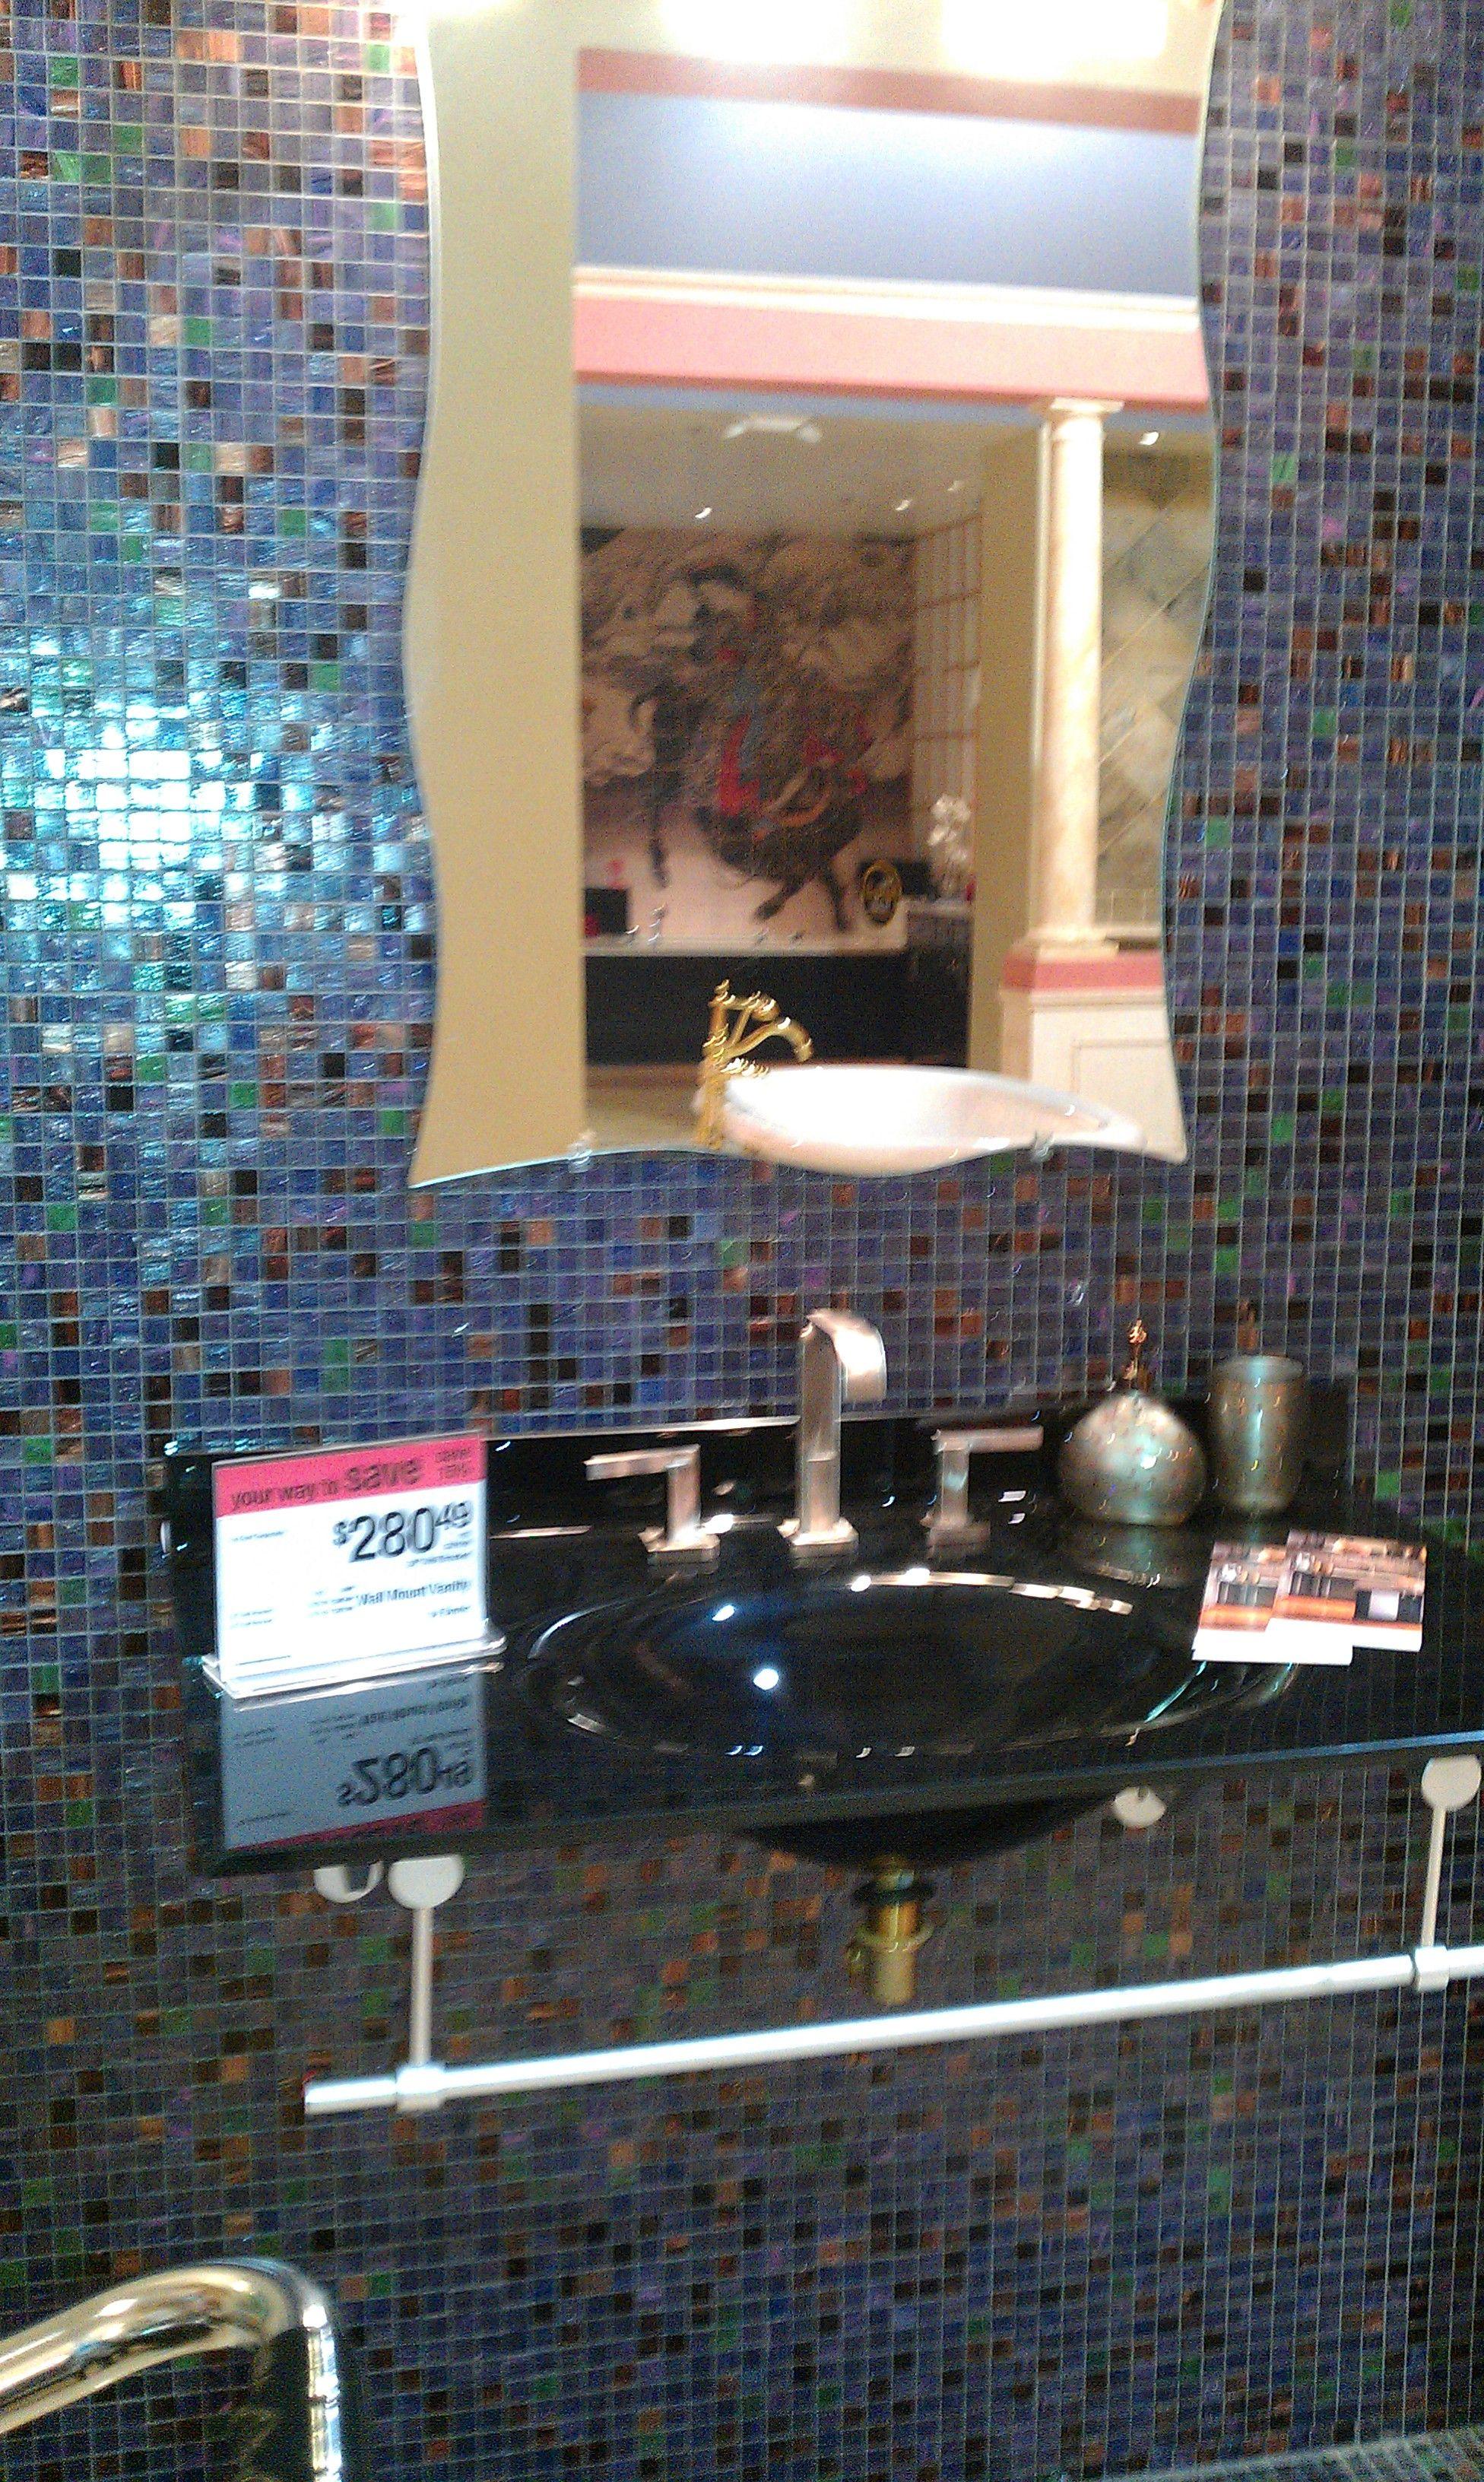 I Like The Tile Behind Mirror In Bathroom Mirror Bathroom Mirror Decor